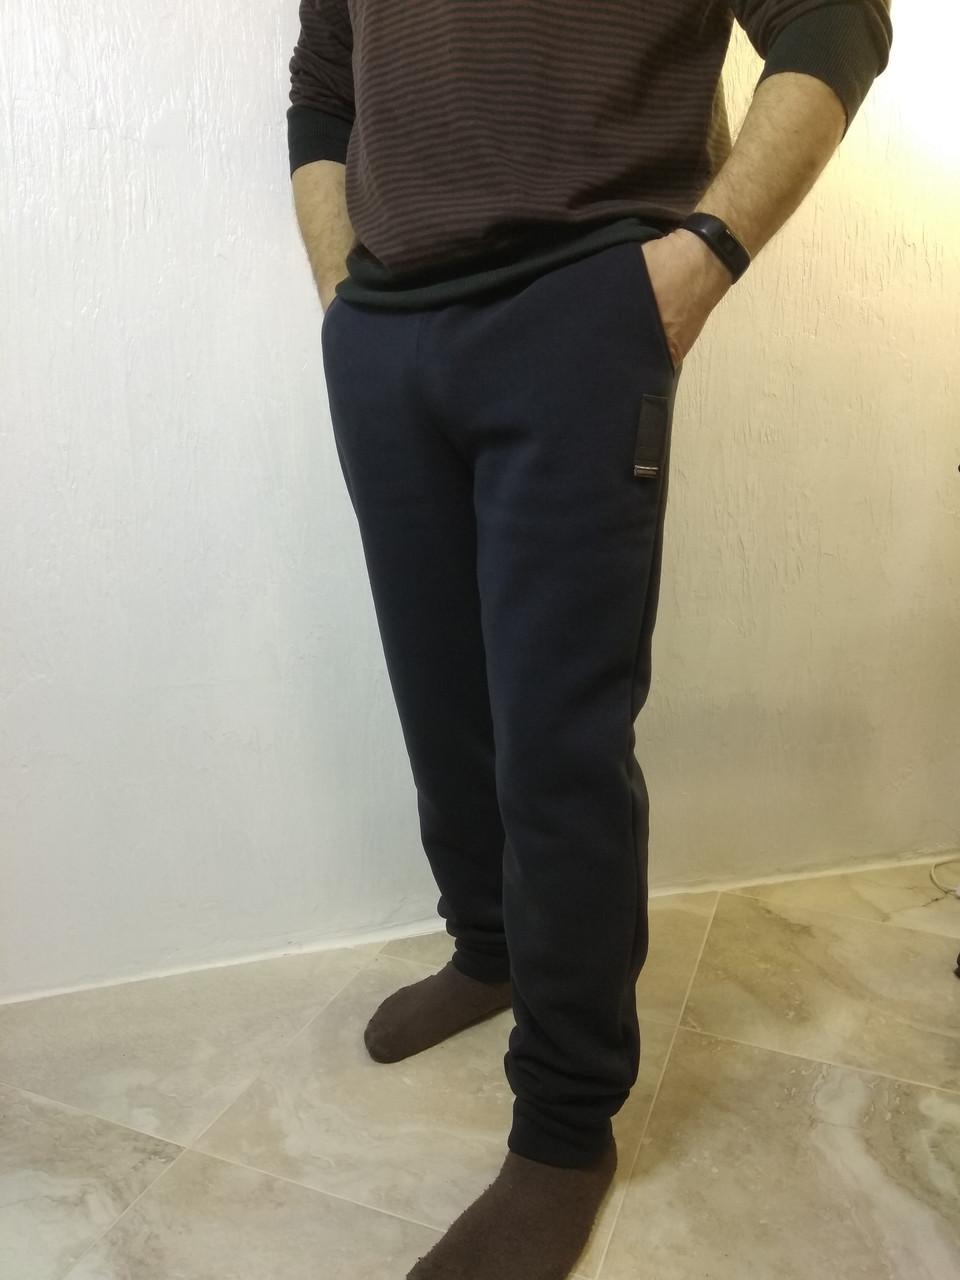 Спортивные штаны на манжетах мужские 52 размер